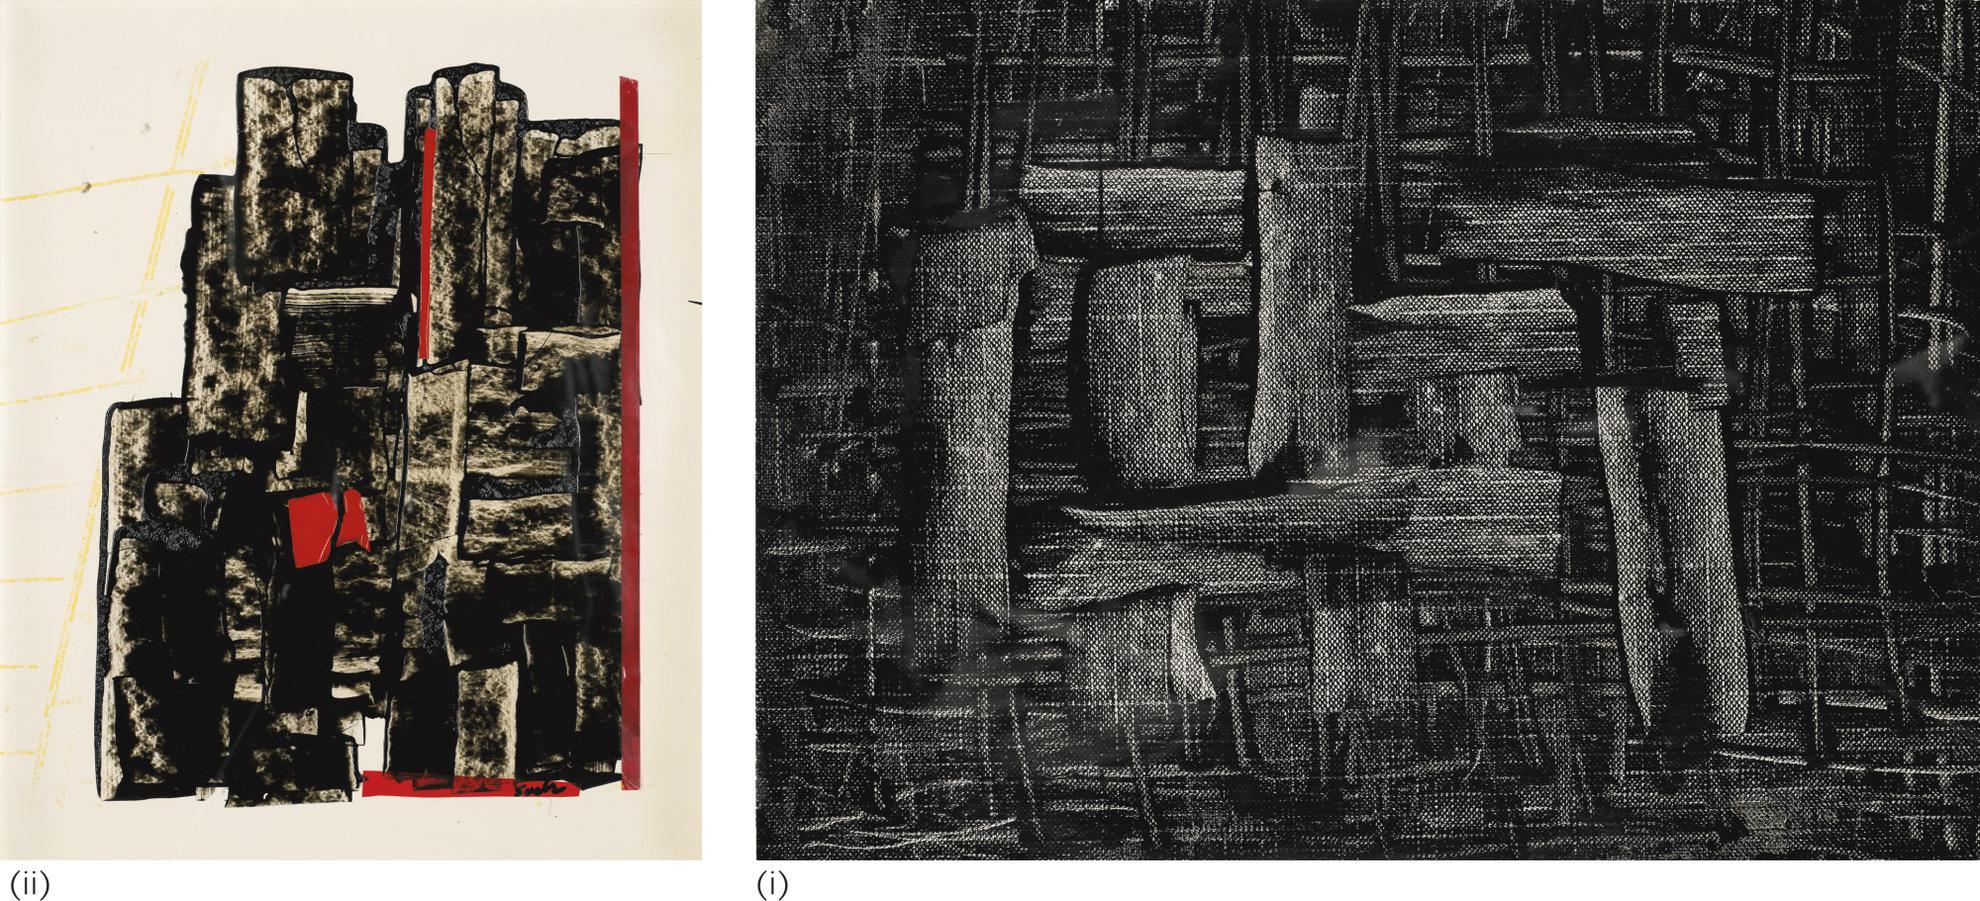 Behjat Sadr - (i) (ii) Untitled-1970